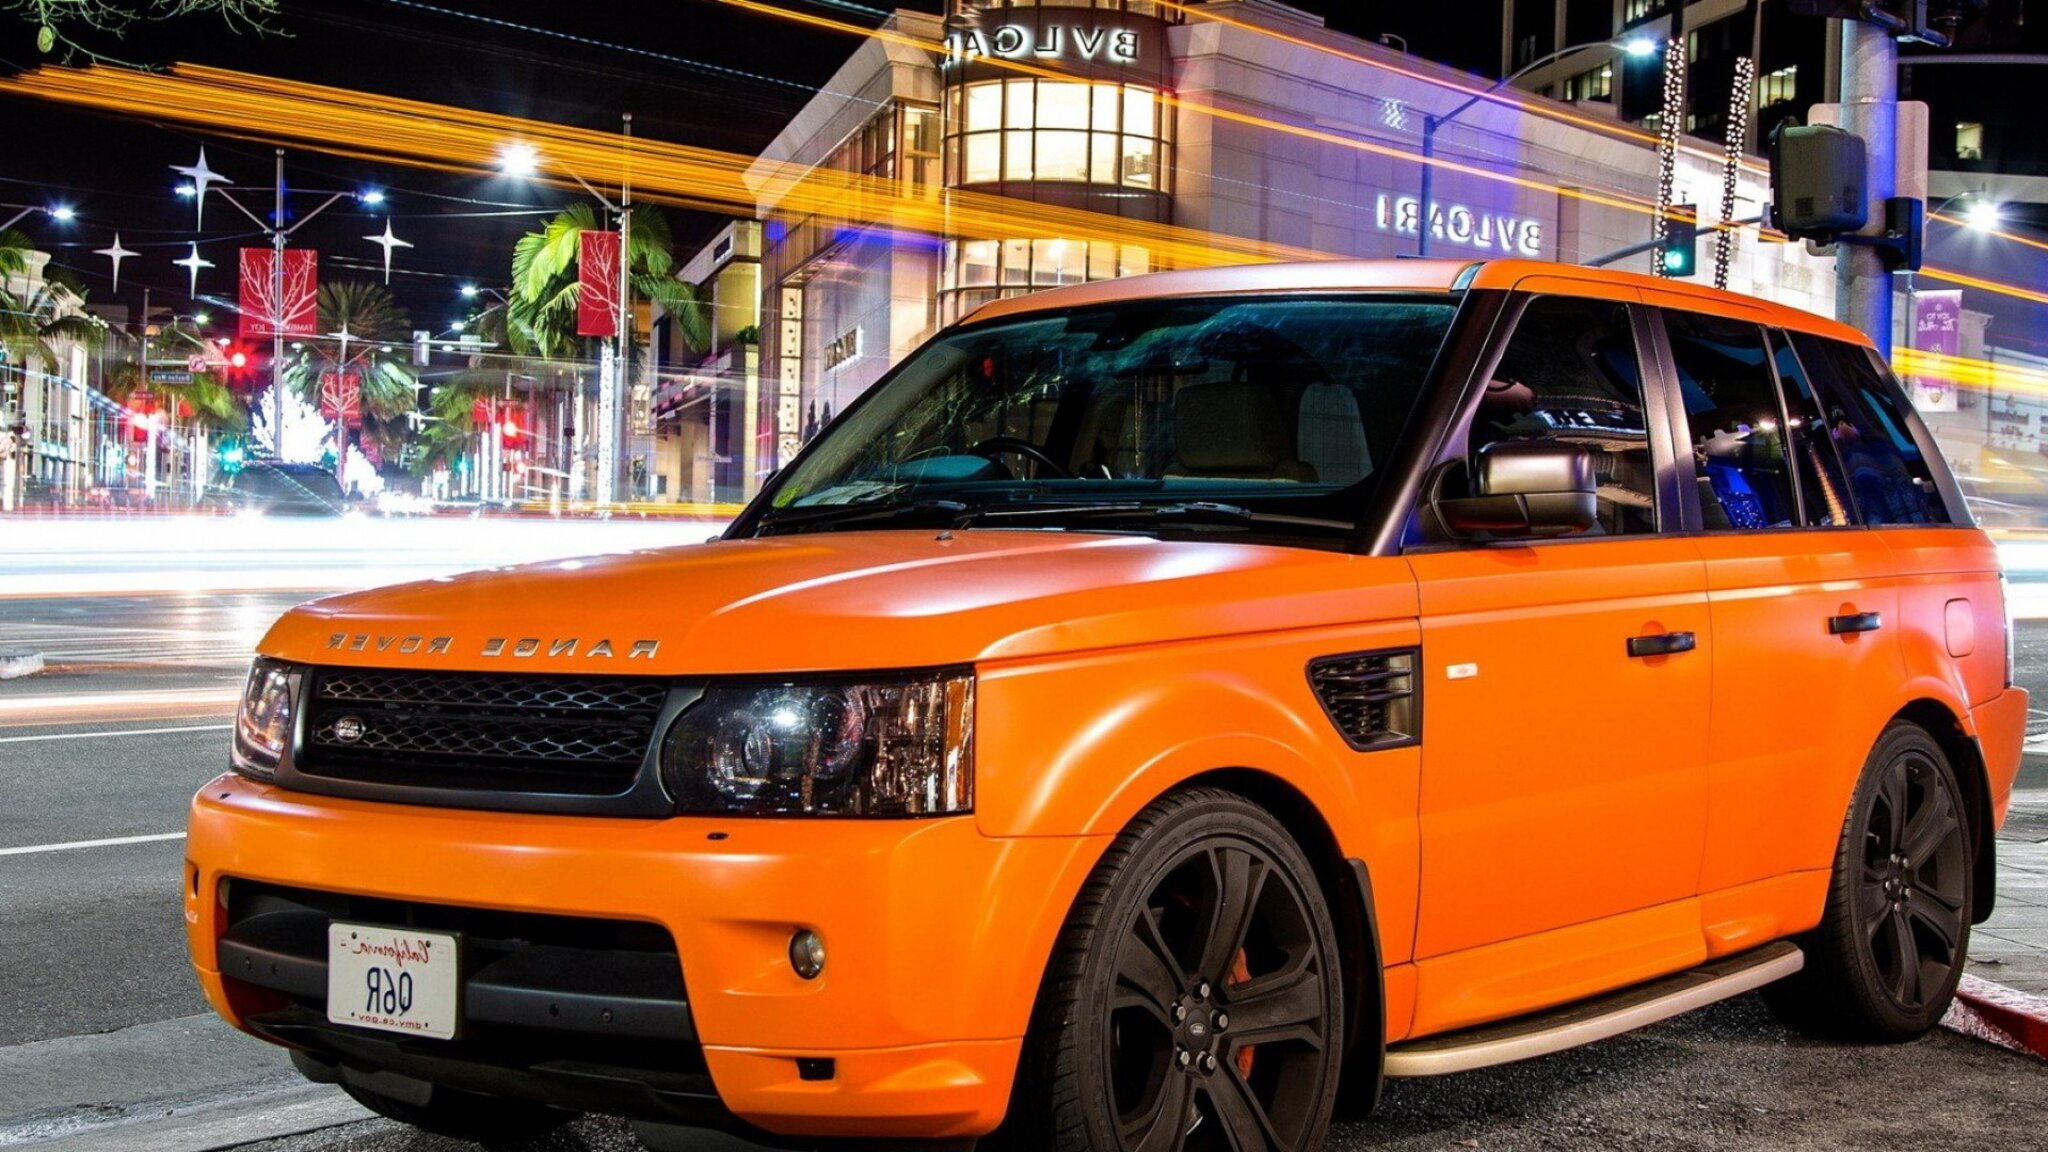 orange-land-rover-pic.jpg